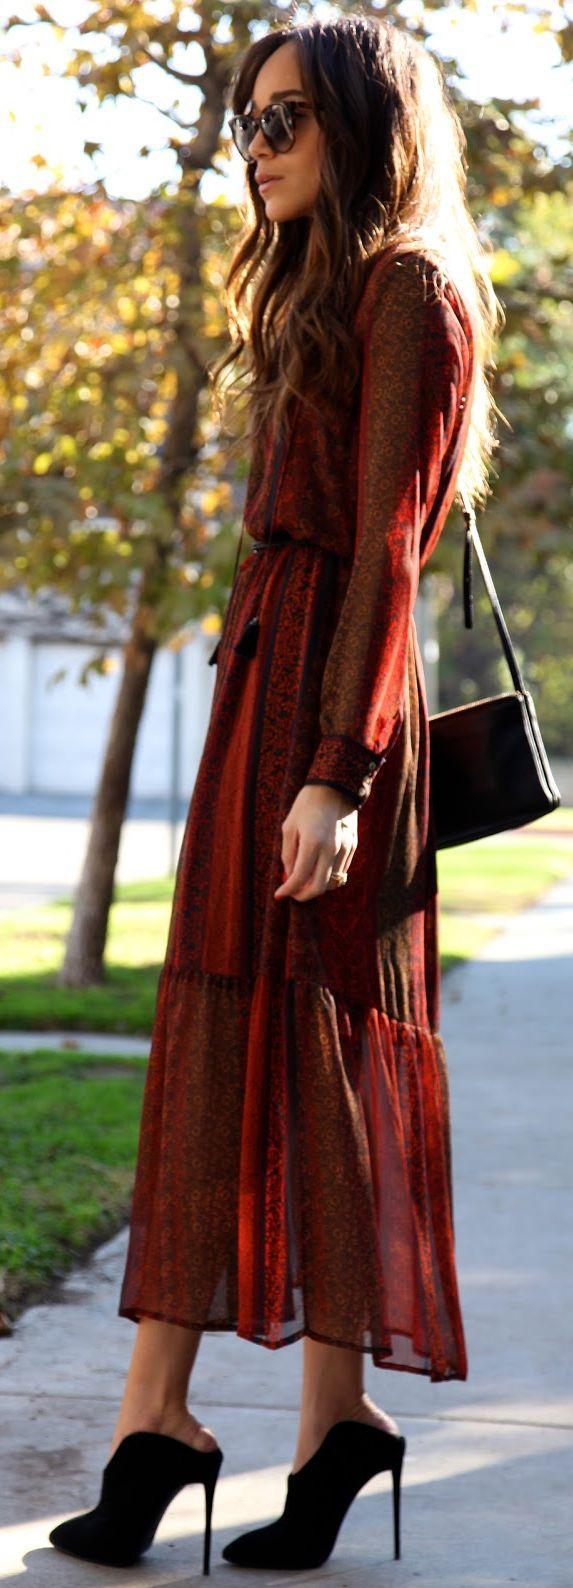 Burgundy Boho Maxi Dress Black Cute Mules by Ring My Bell